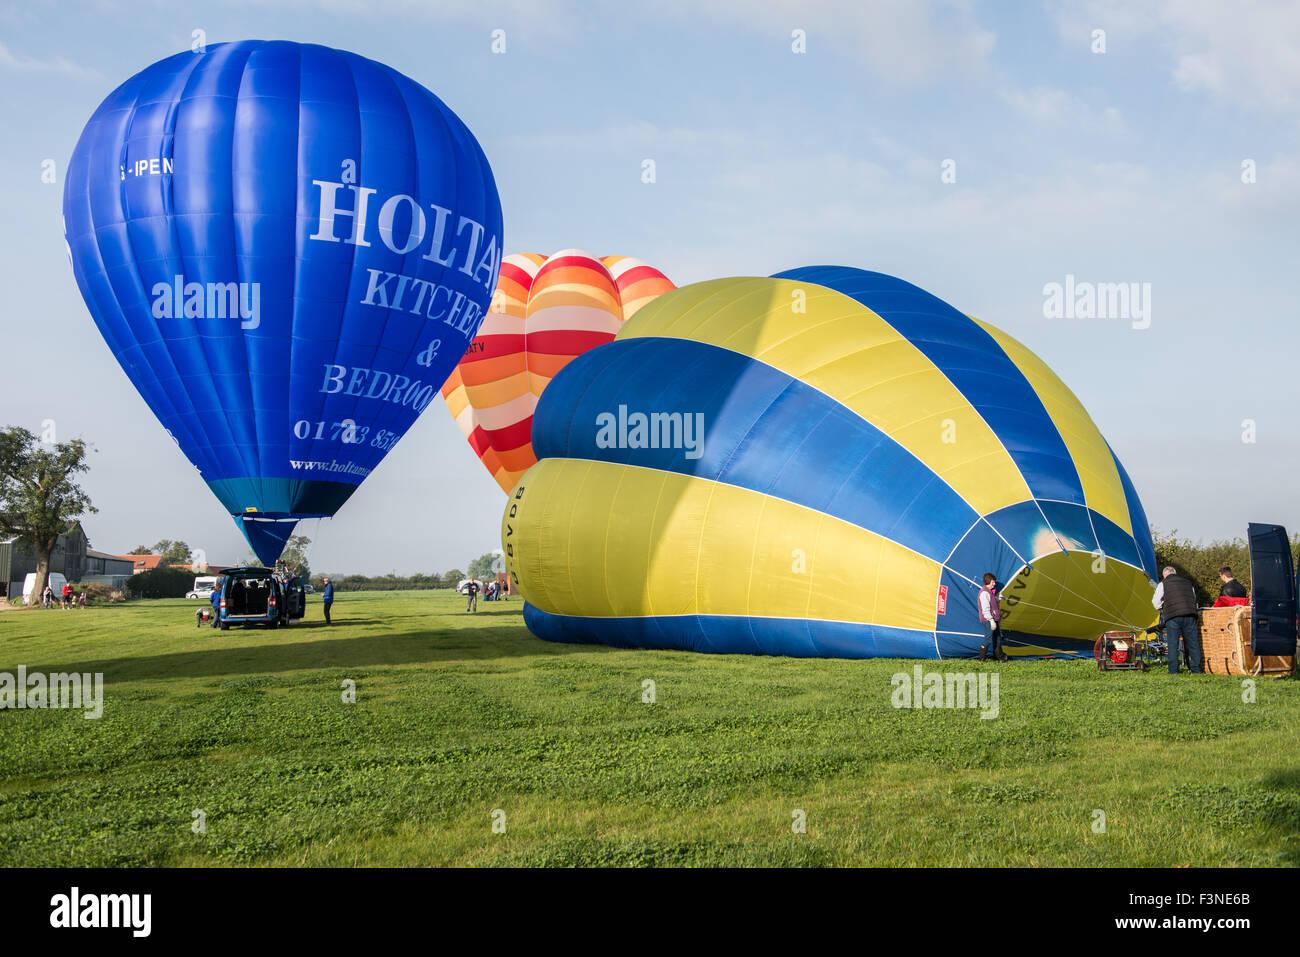 Thornton Dale, North Yorkshire, UK. 10th Oct, 2015. Saturday 10th, October 2015. Pilot Graham Holtam prepares the - Stock Image